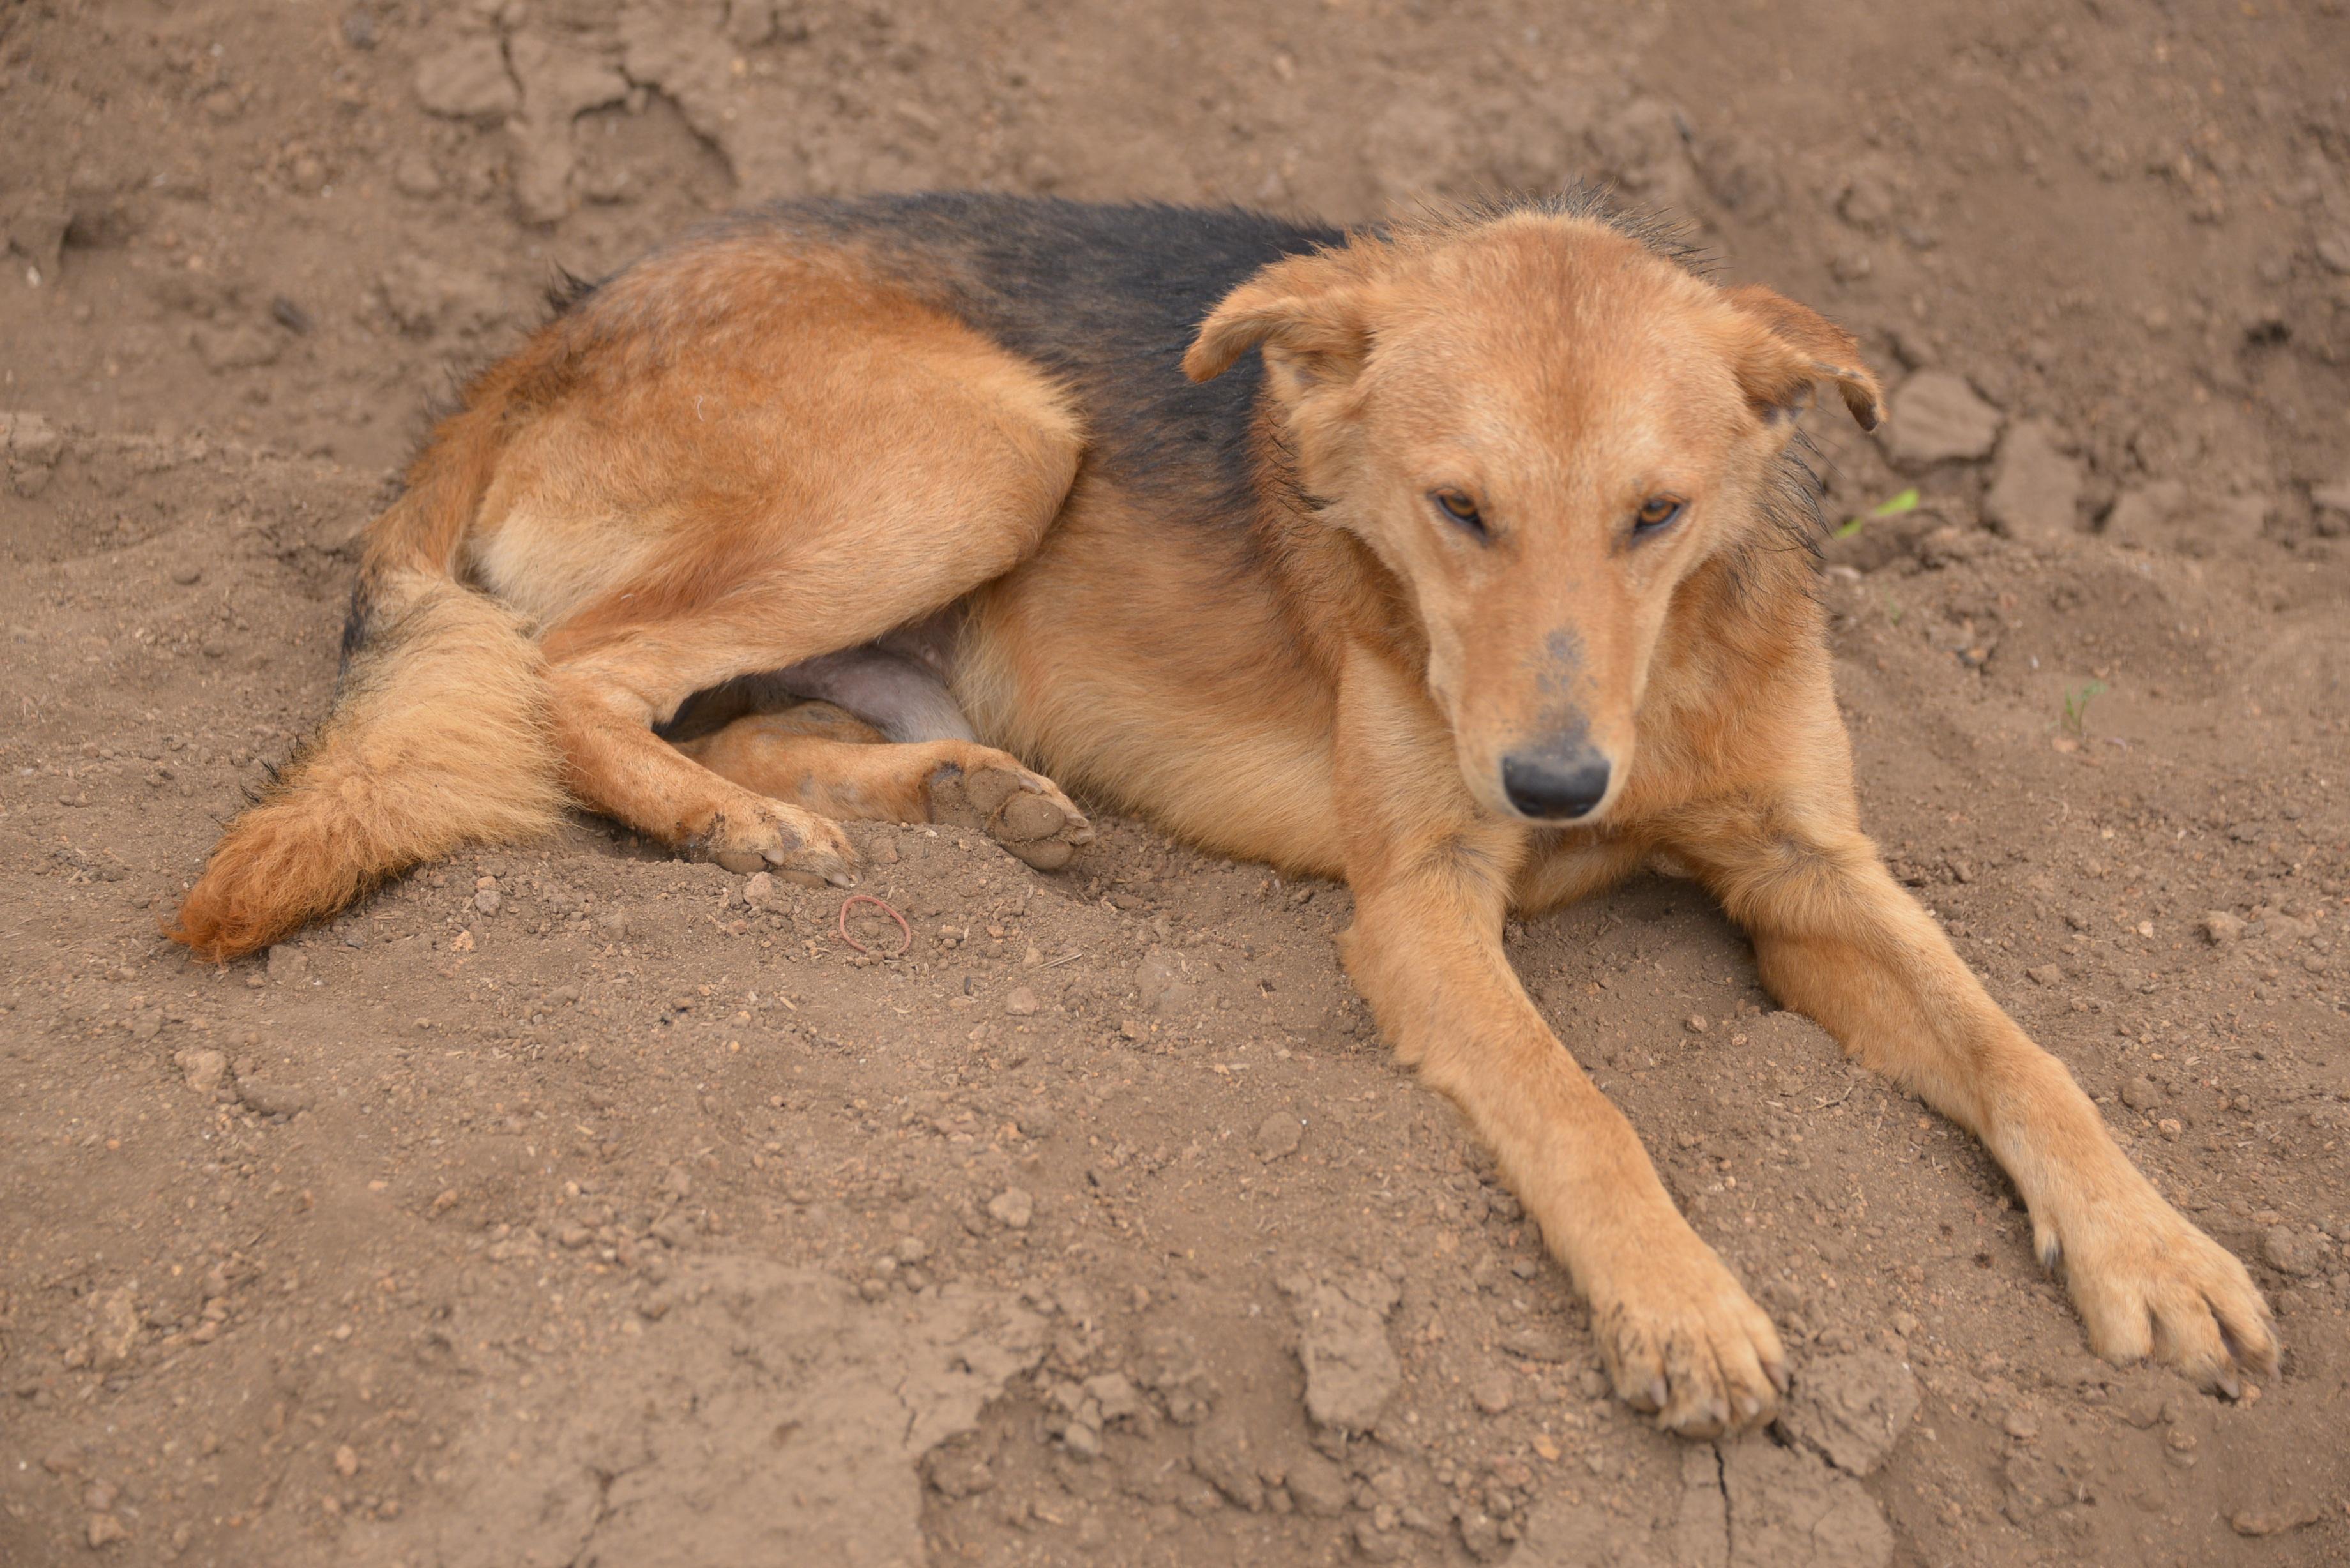 Fotos gratis : perrito, canino, país, mascota, perezoso, soñoliento ...